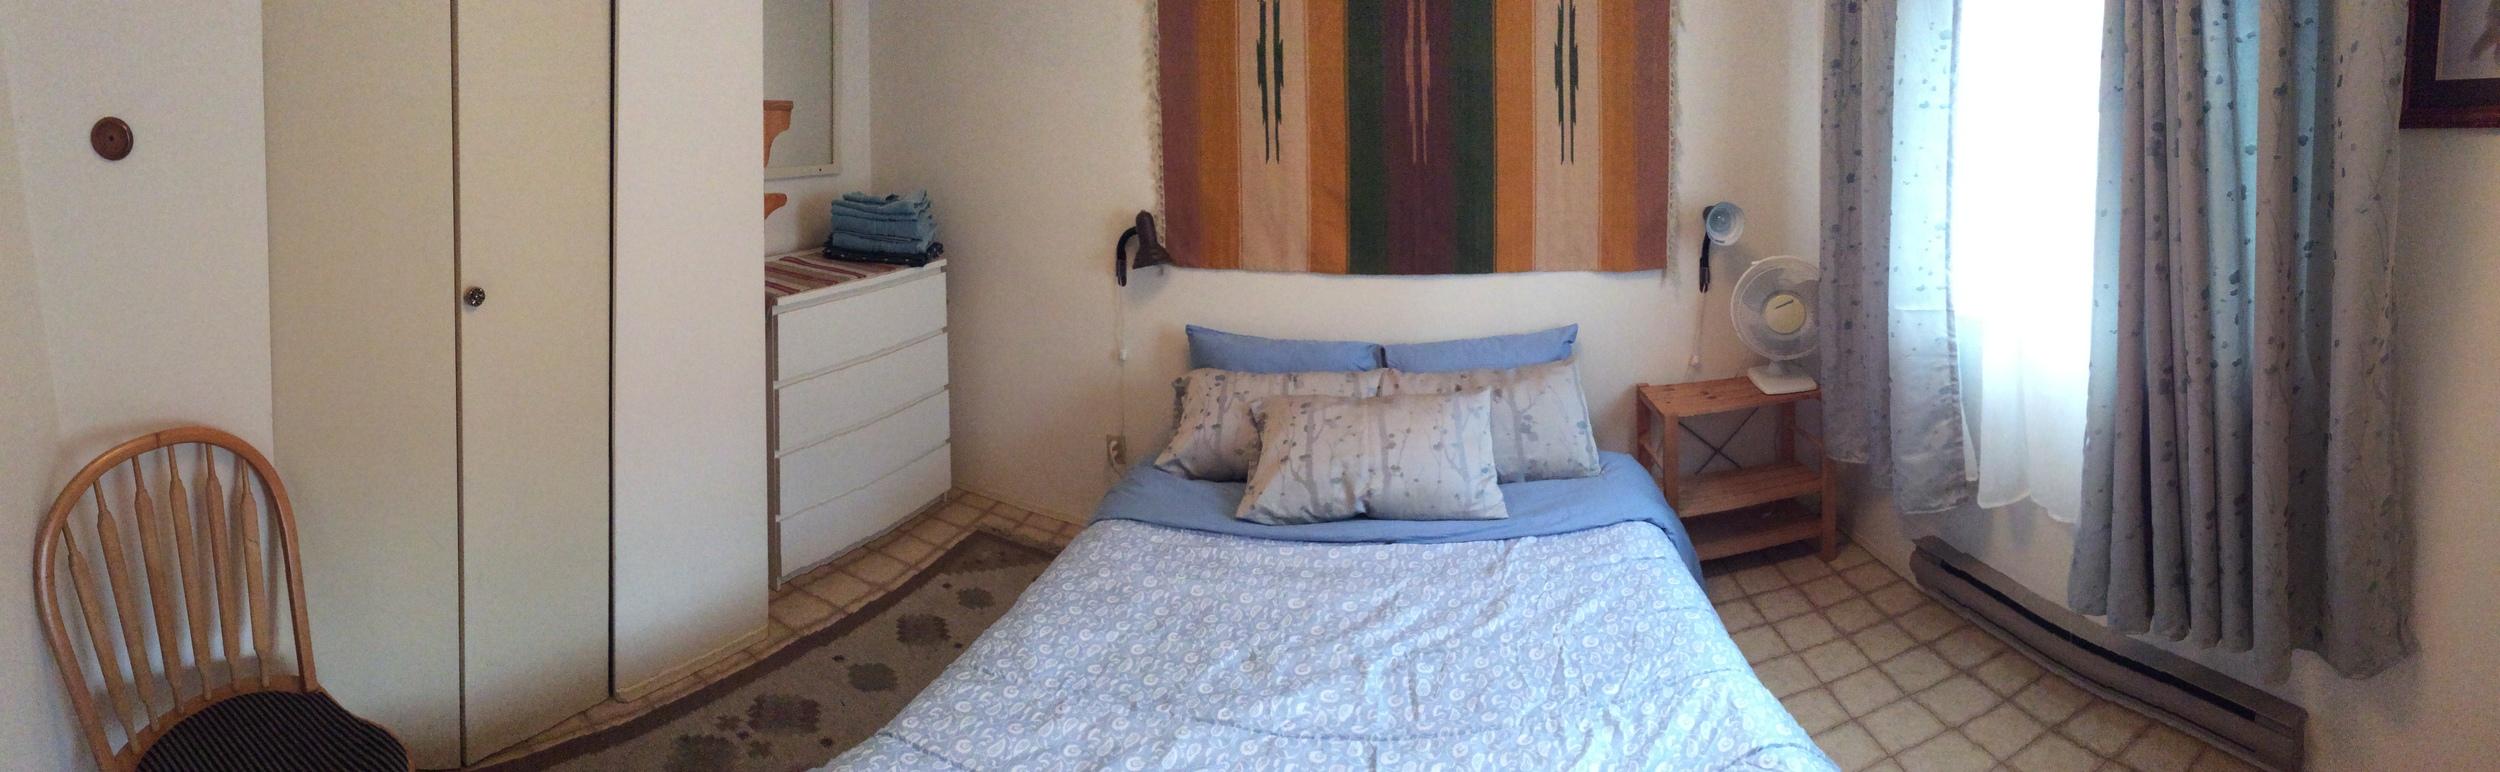 View Bedroom 2.jpg